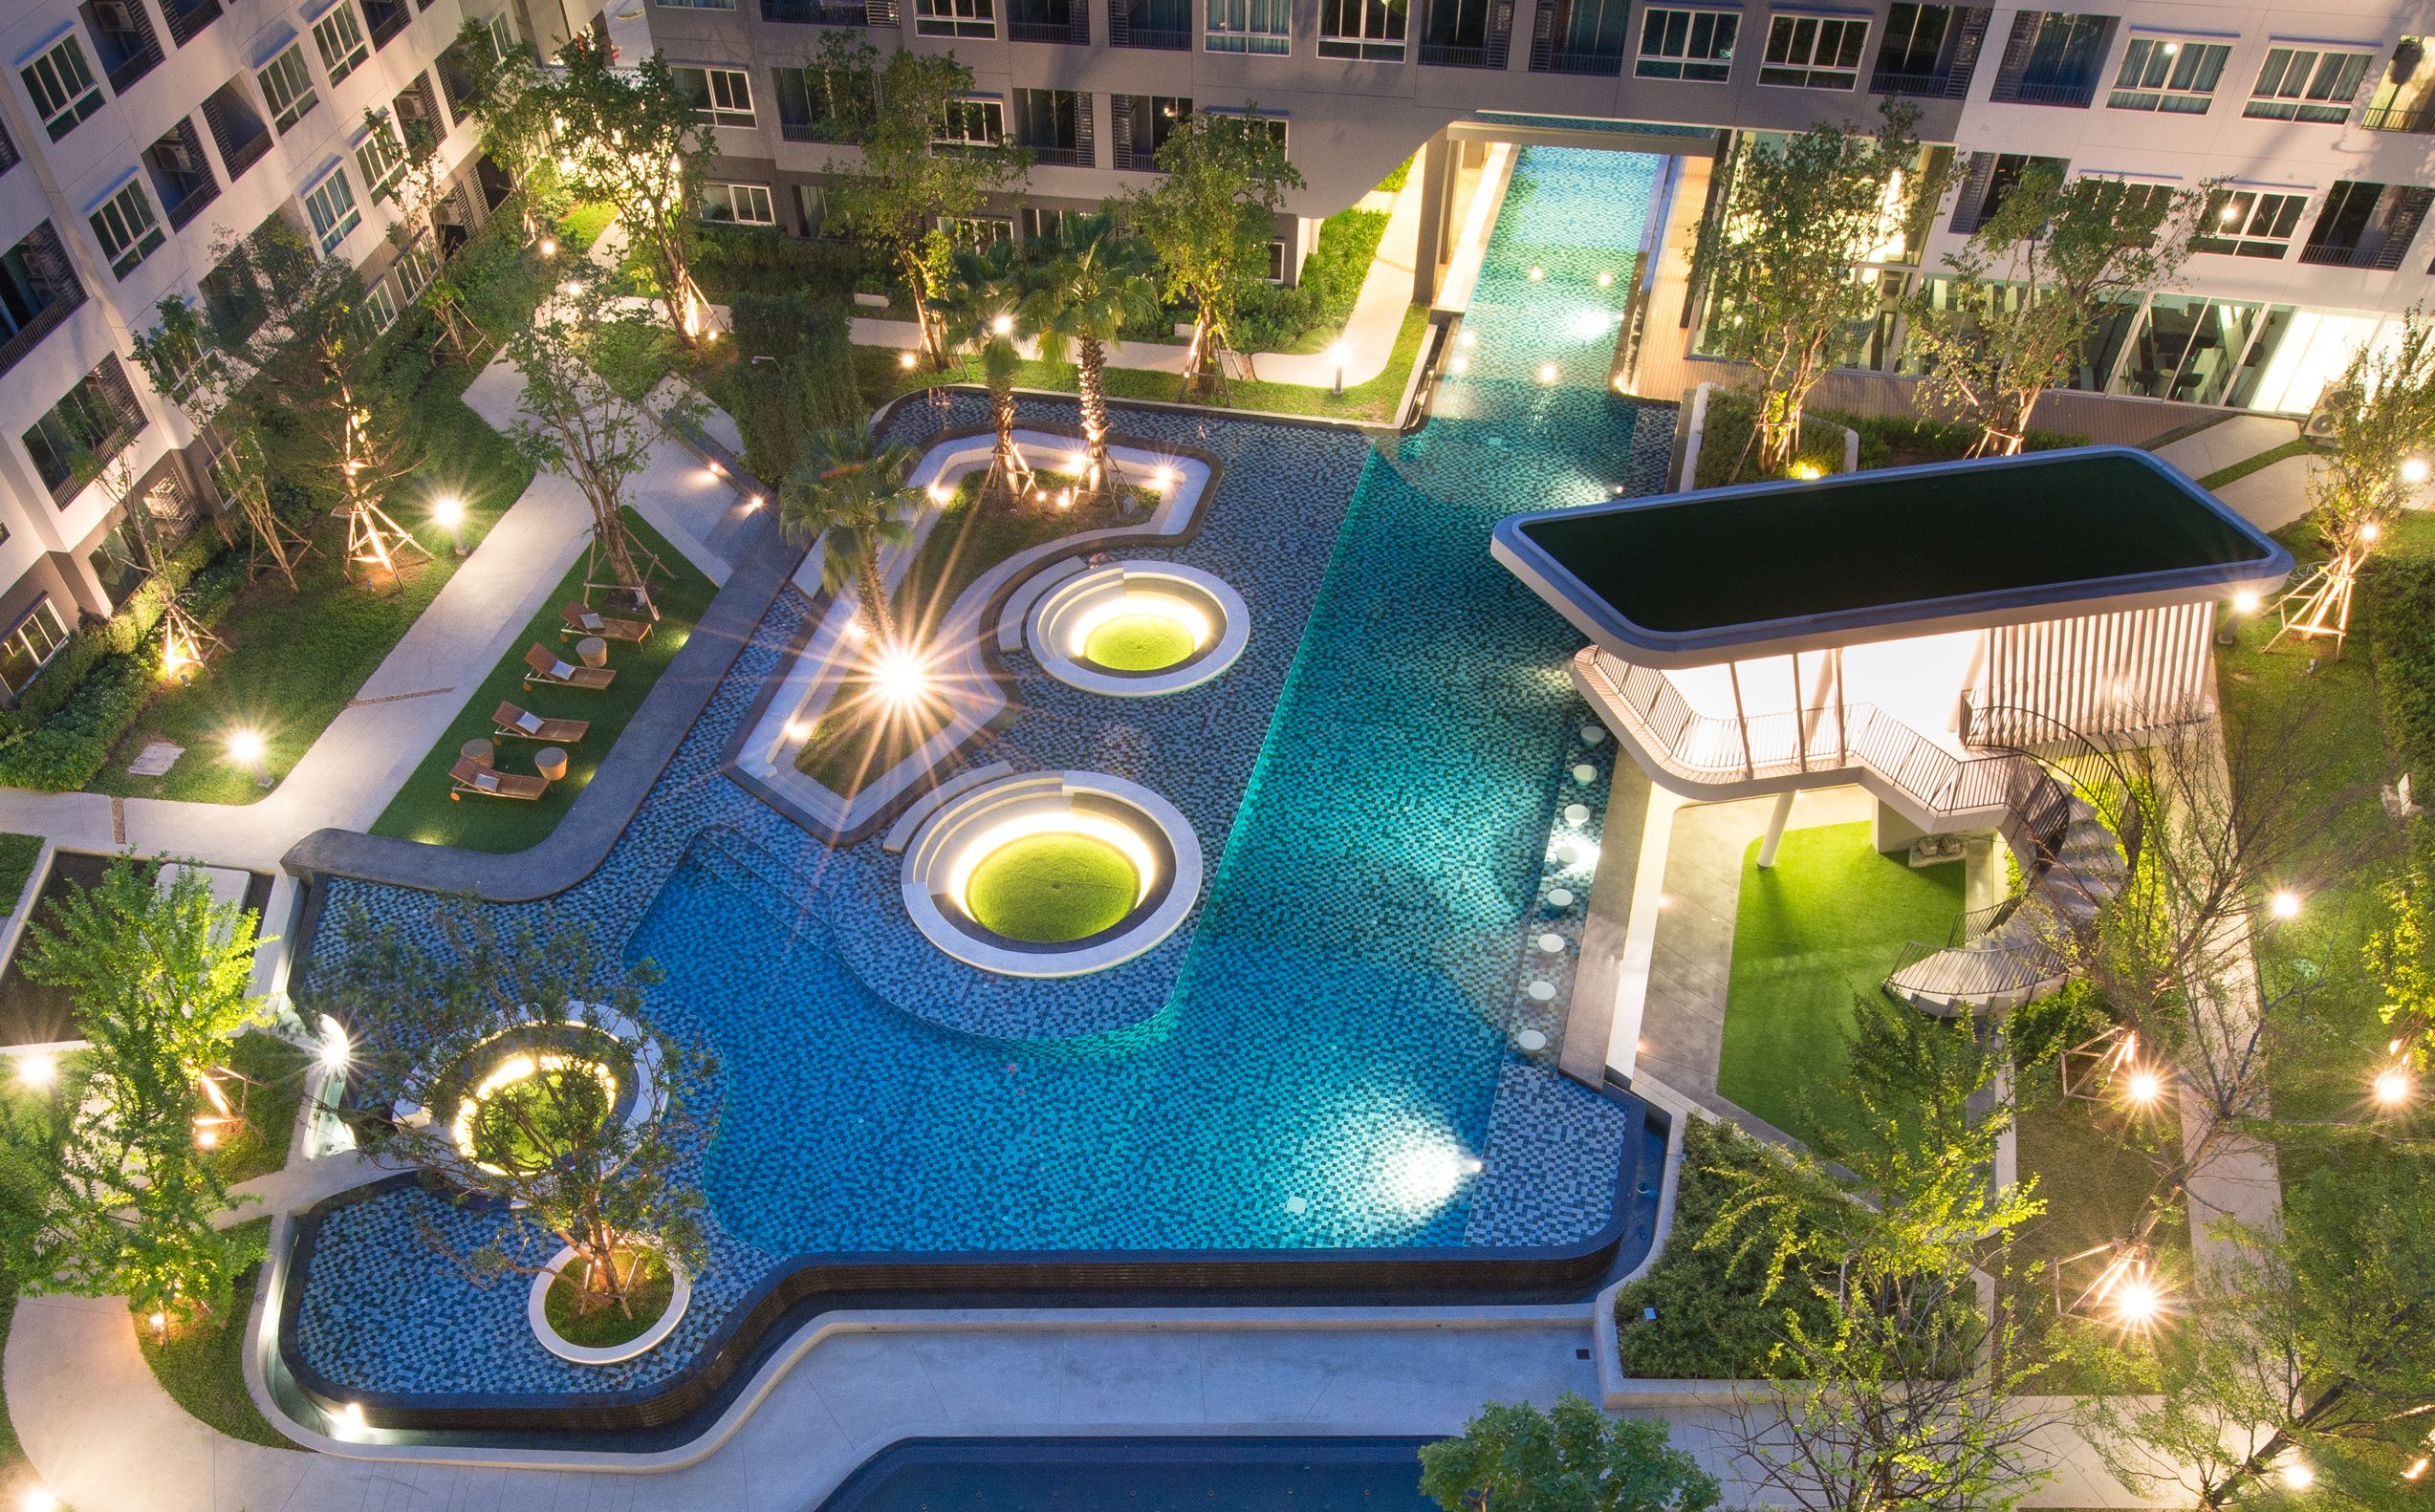 Landscape Design Redland Scape Ltd Resort Feeling In Town Project Elio Del Ray By Ananda Development Redlandscape Thiết Kế Bể Bơi Thiết Kế đo Thị